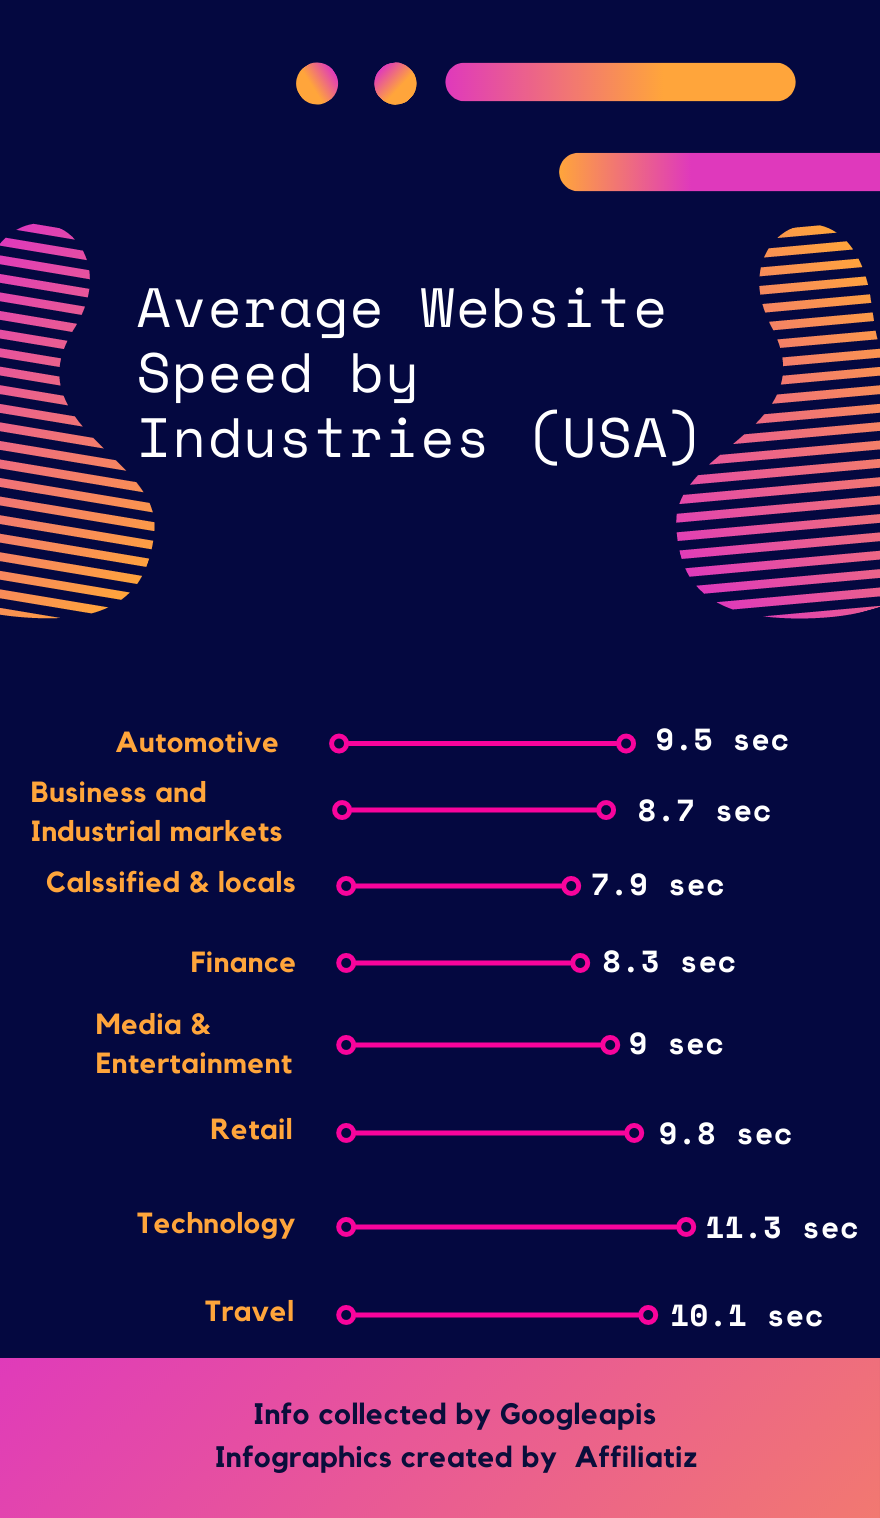 average website speed by industries